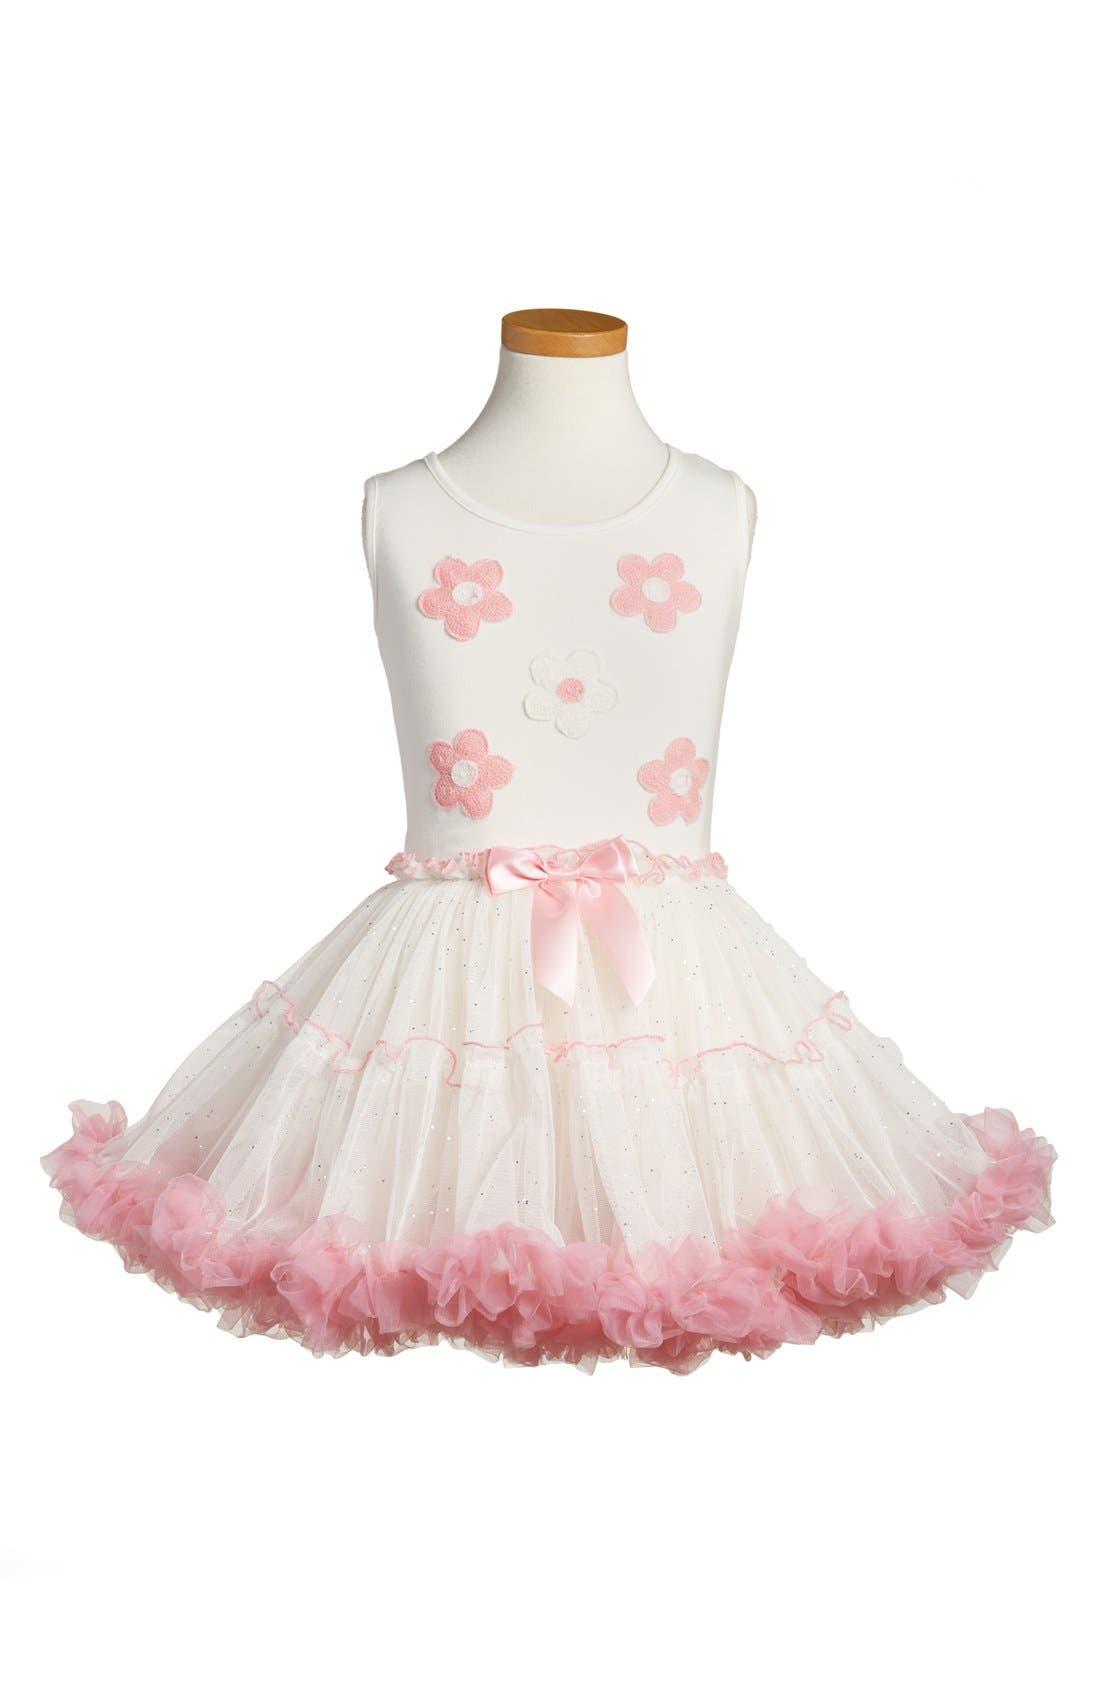 POPATU Embroidered Daisy Tutu Dress